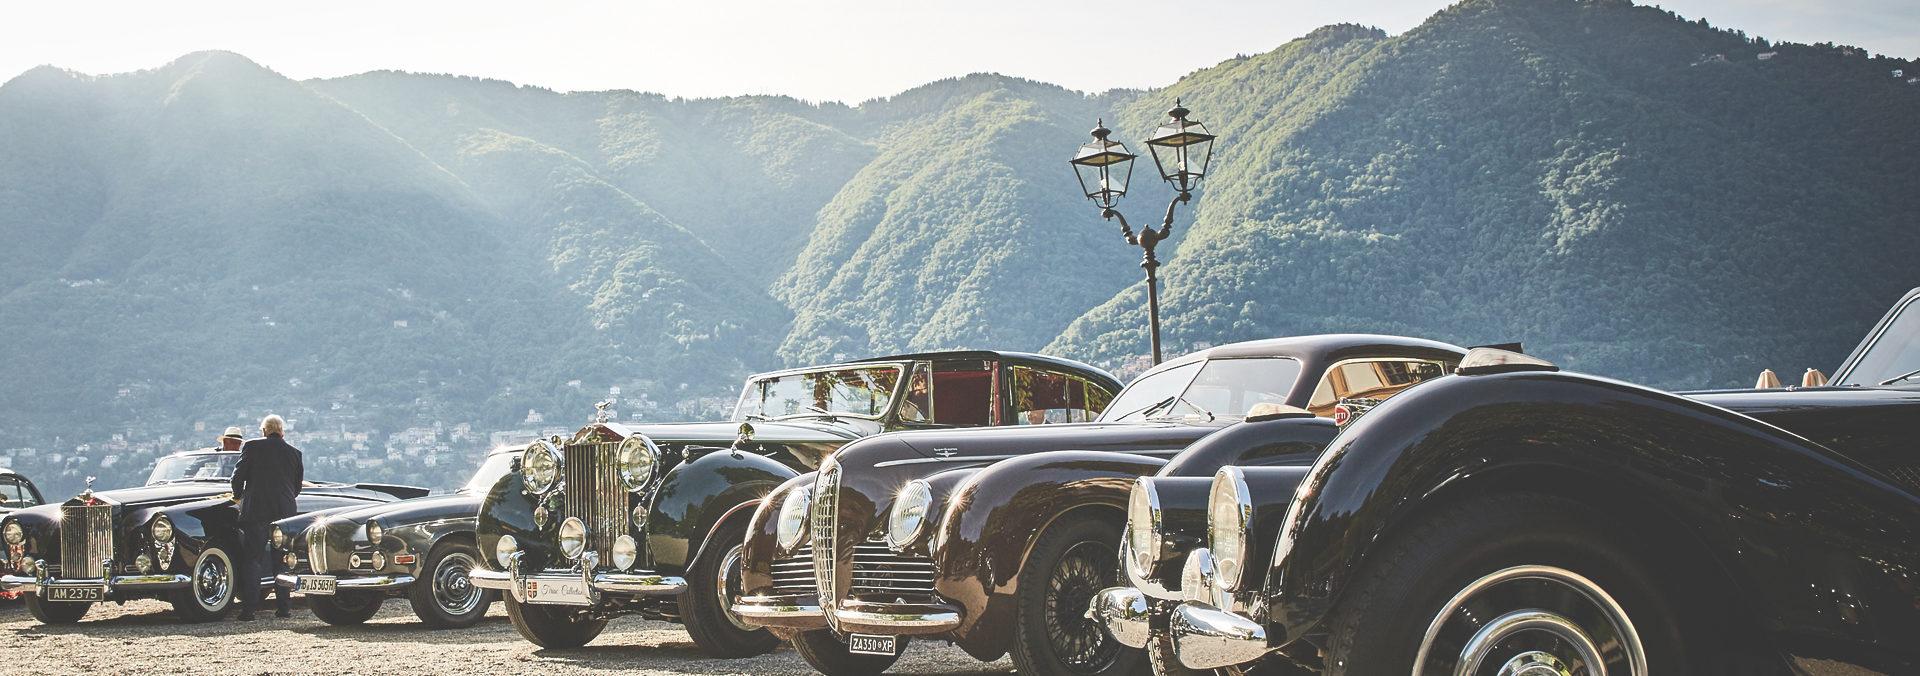 The Event - Concorso d'Eleganza Villa d'Este